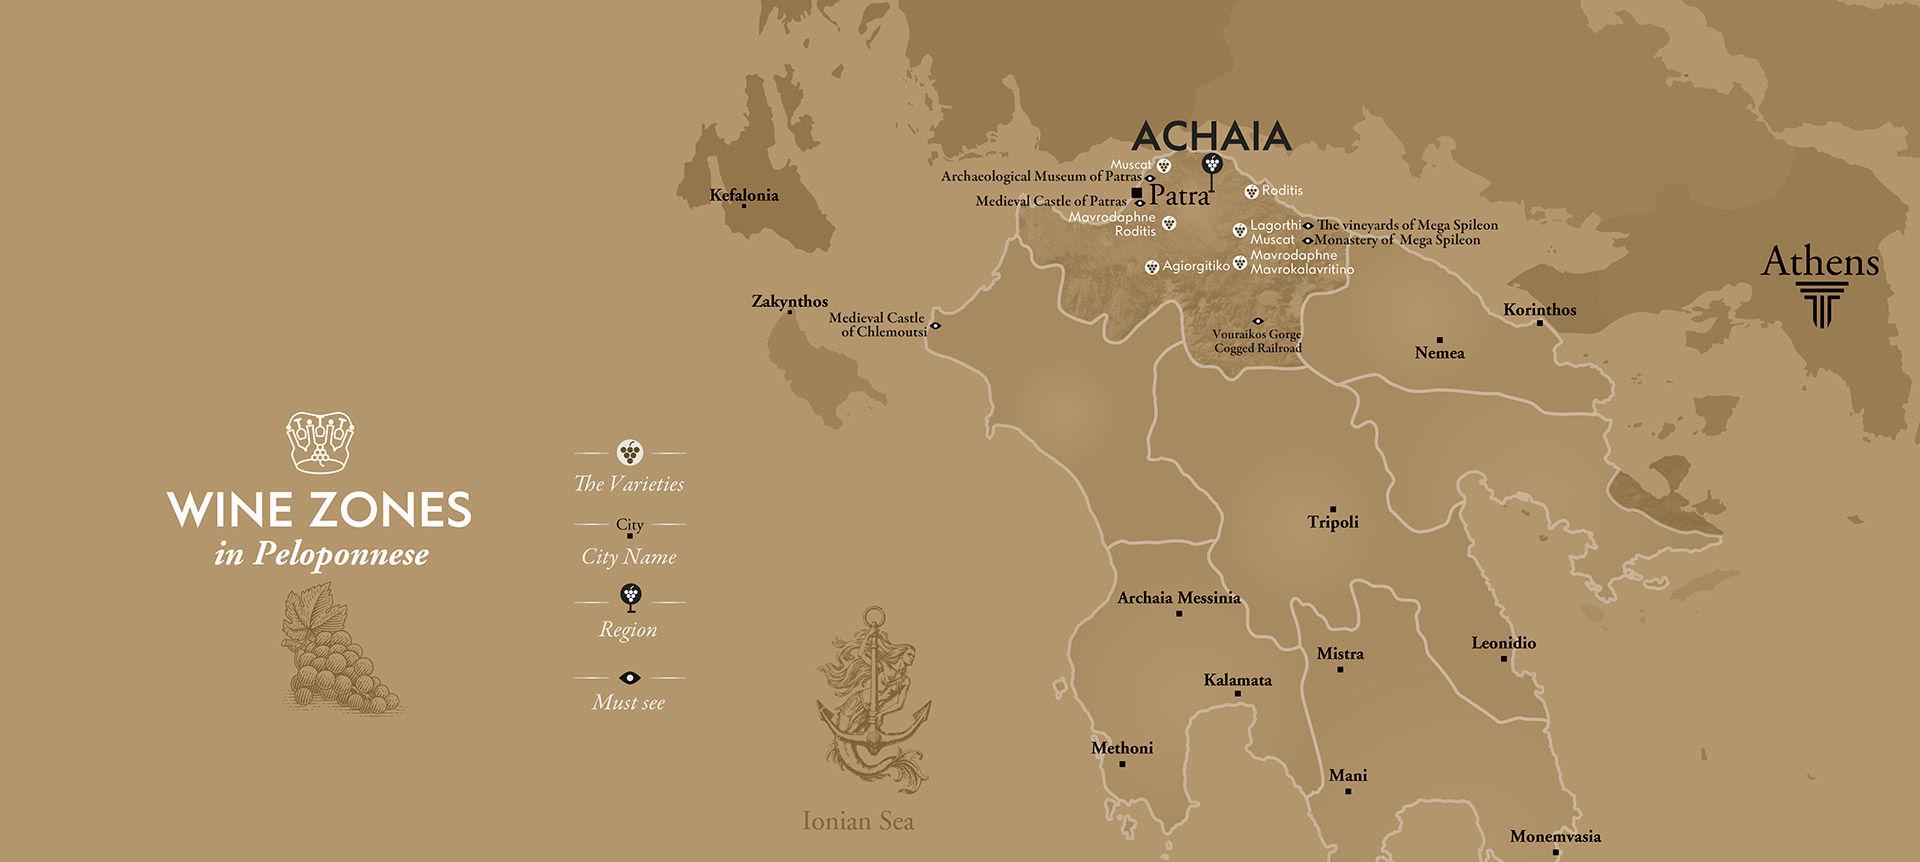 Achaia Clauss wine tour, Patra wine tour, wine tour of Greece, luxury wine tour Patra, Greece wine tour, Gustav Clauss ,Greece luxury tours